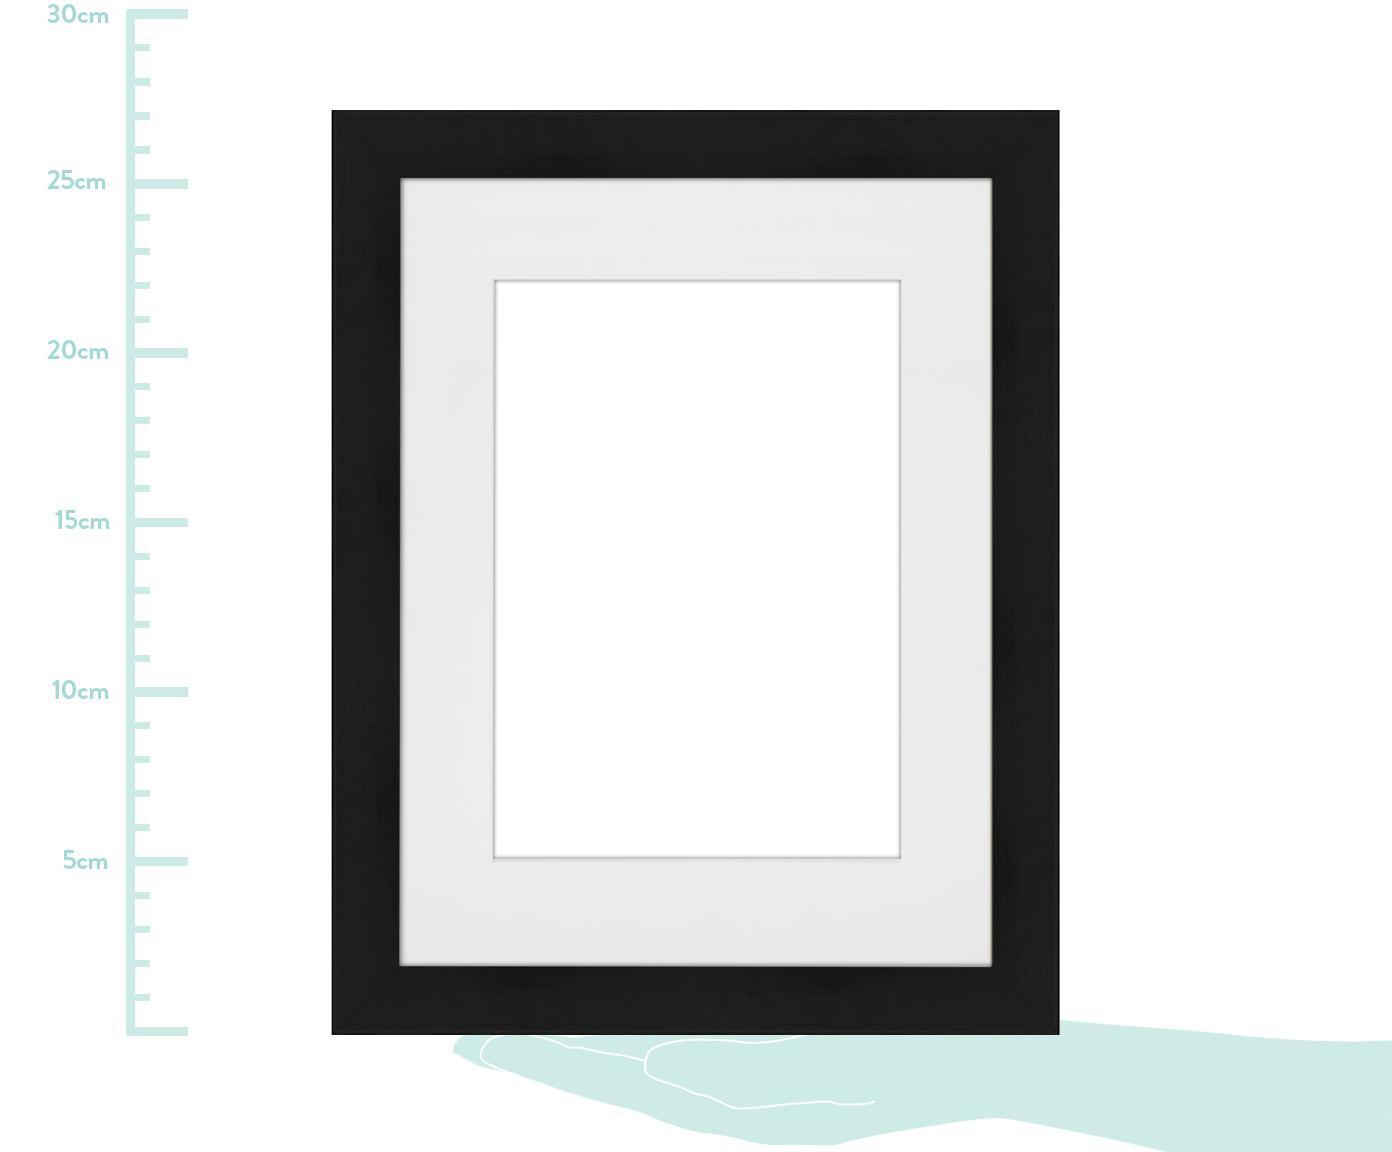 Bilderrahmen Apollon, Rahmen: Monterey-Kiefernholz, lac, Front: Glas, Rückseite: Mitteldichte Holzfaserpla, Schwarz, 18 x 24 cm